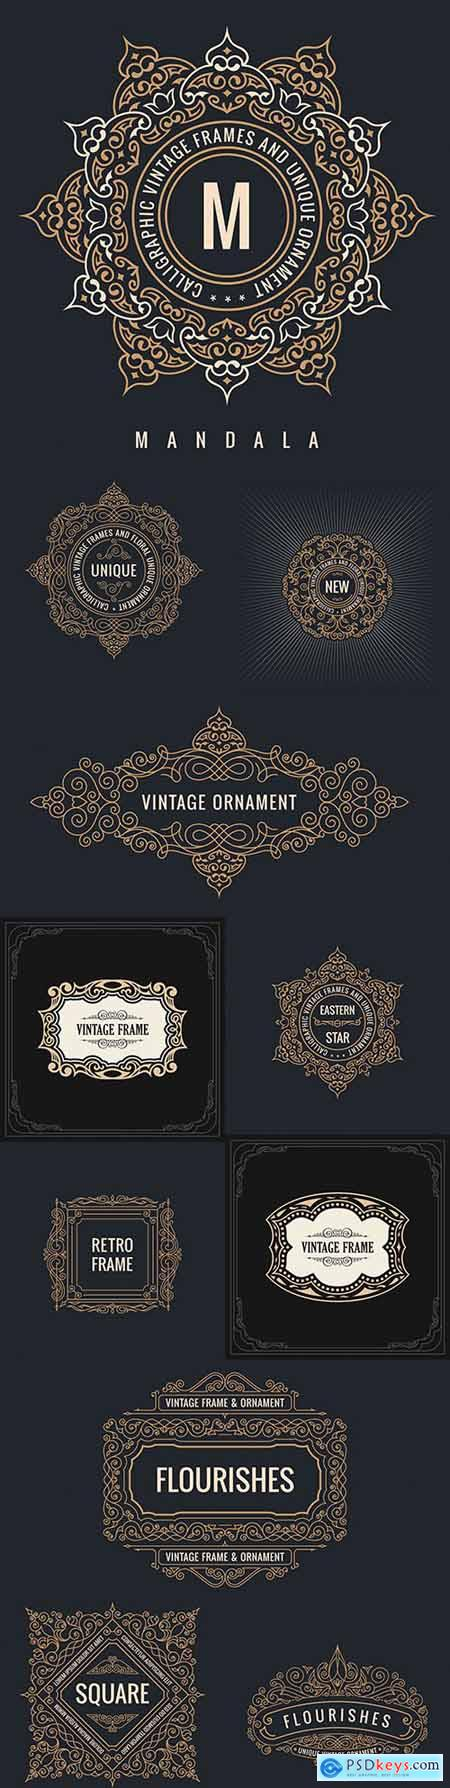 Calligraphic vintage frame and elegant ornament design